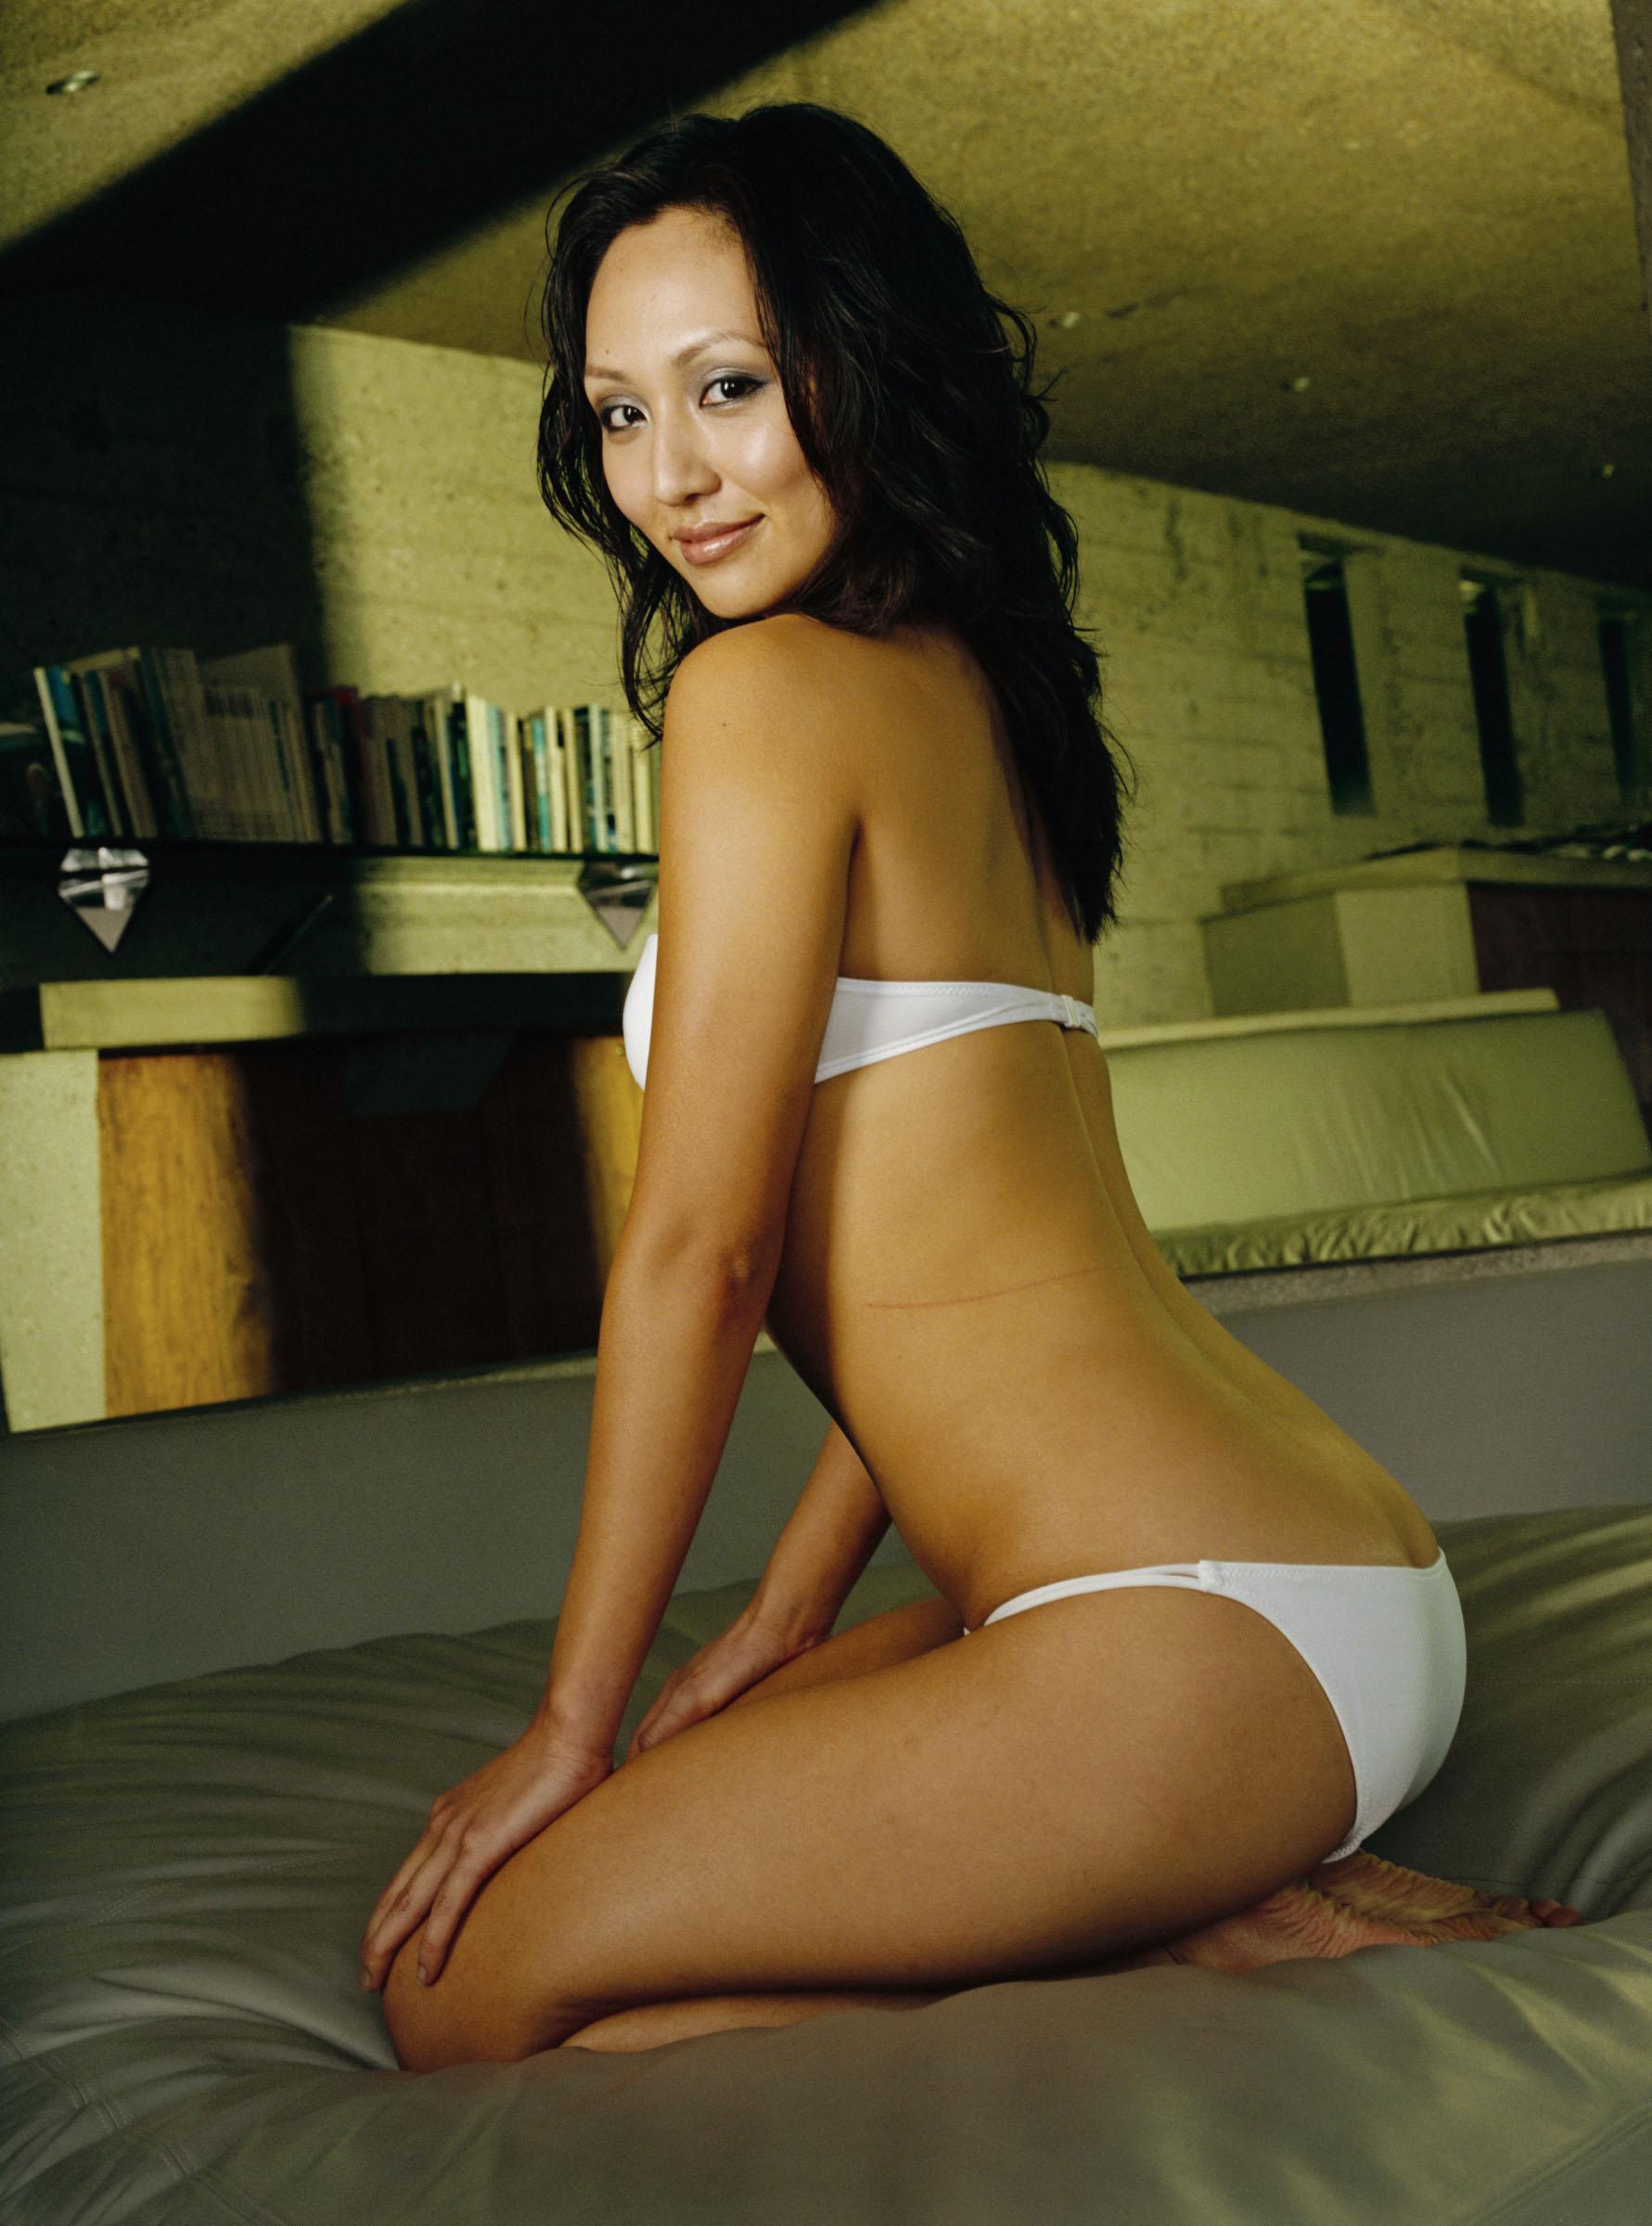 Amy Acker Nackt beth's modeling agency card, from beth fan page | radio gunk